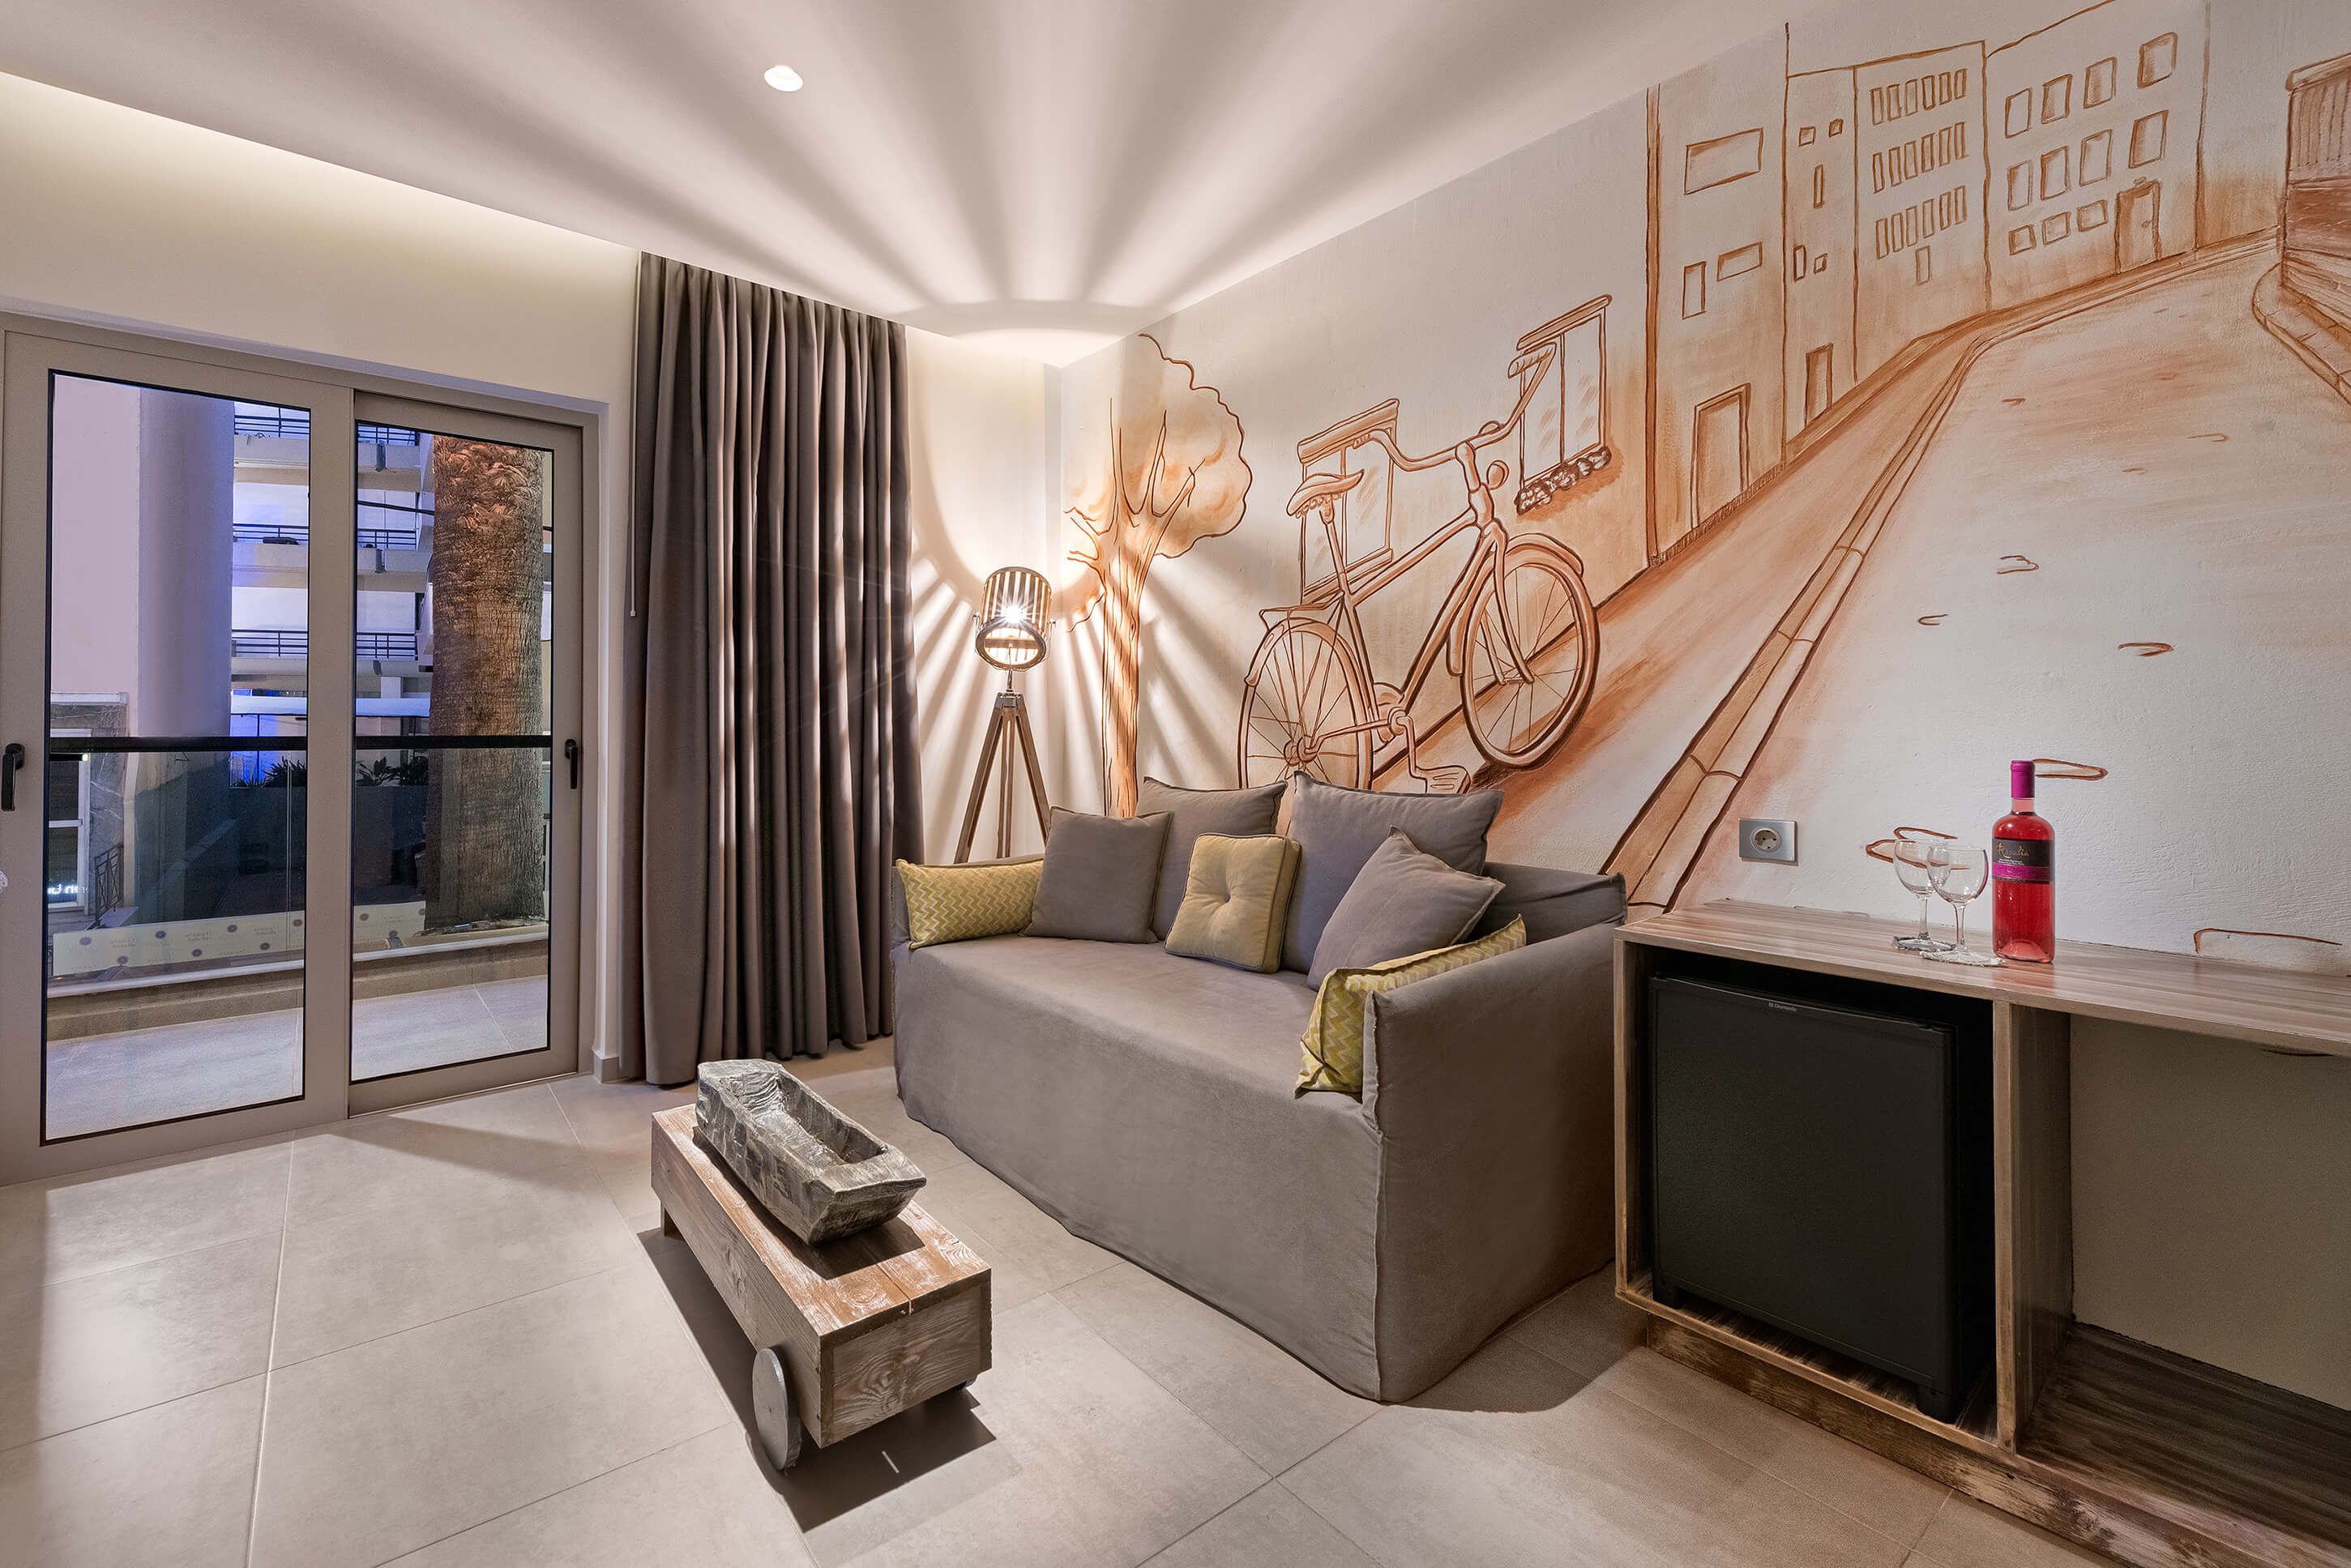 Aspalathos Suite Living Room - Elakati Luxury Boutique Hotel in Rhodes